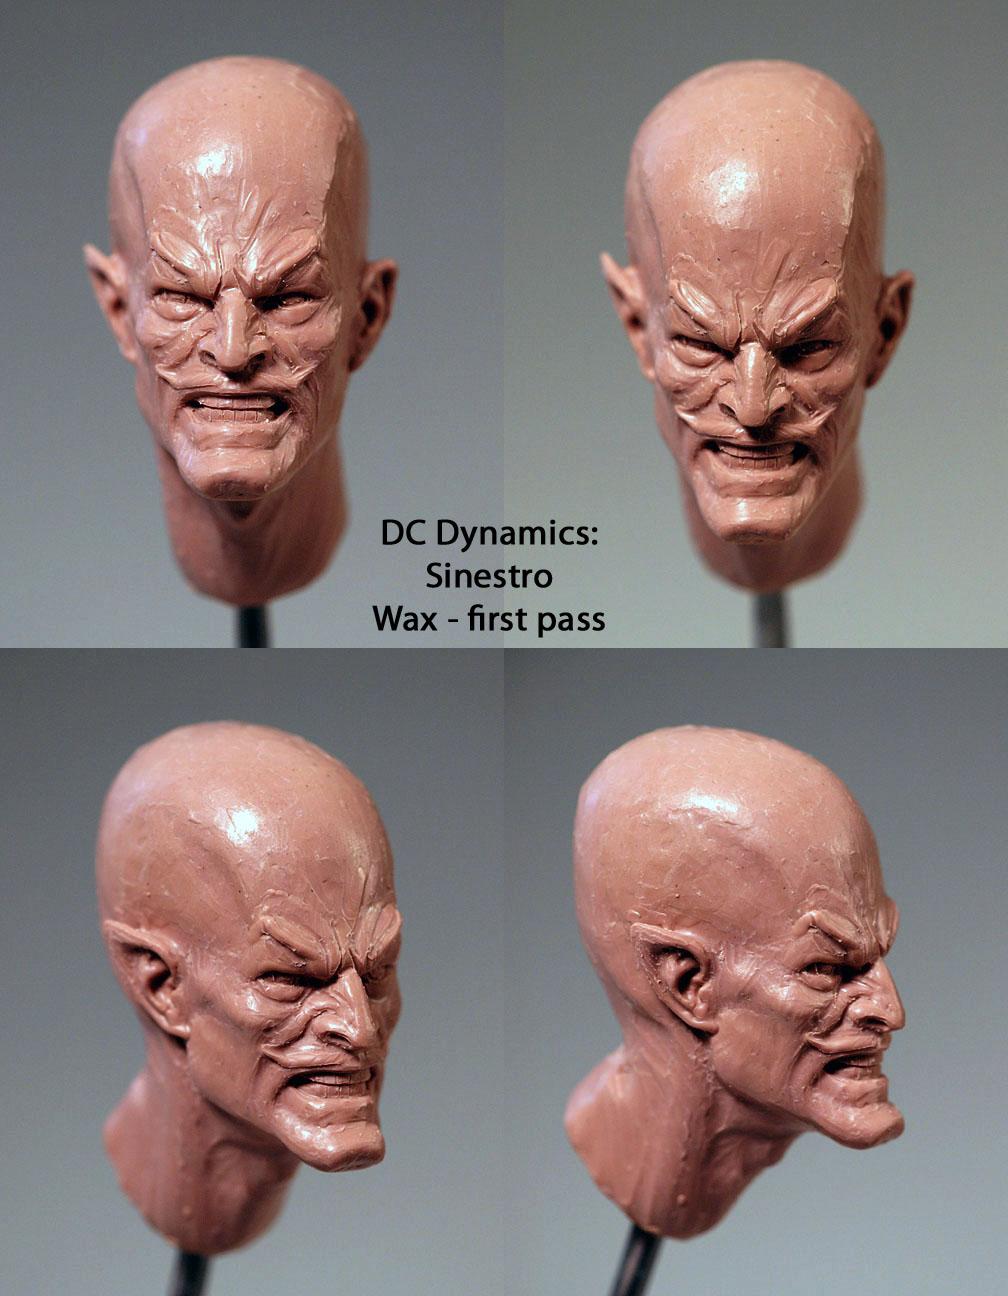 DC Dynamics: Sinestro